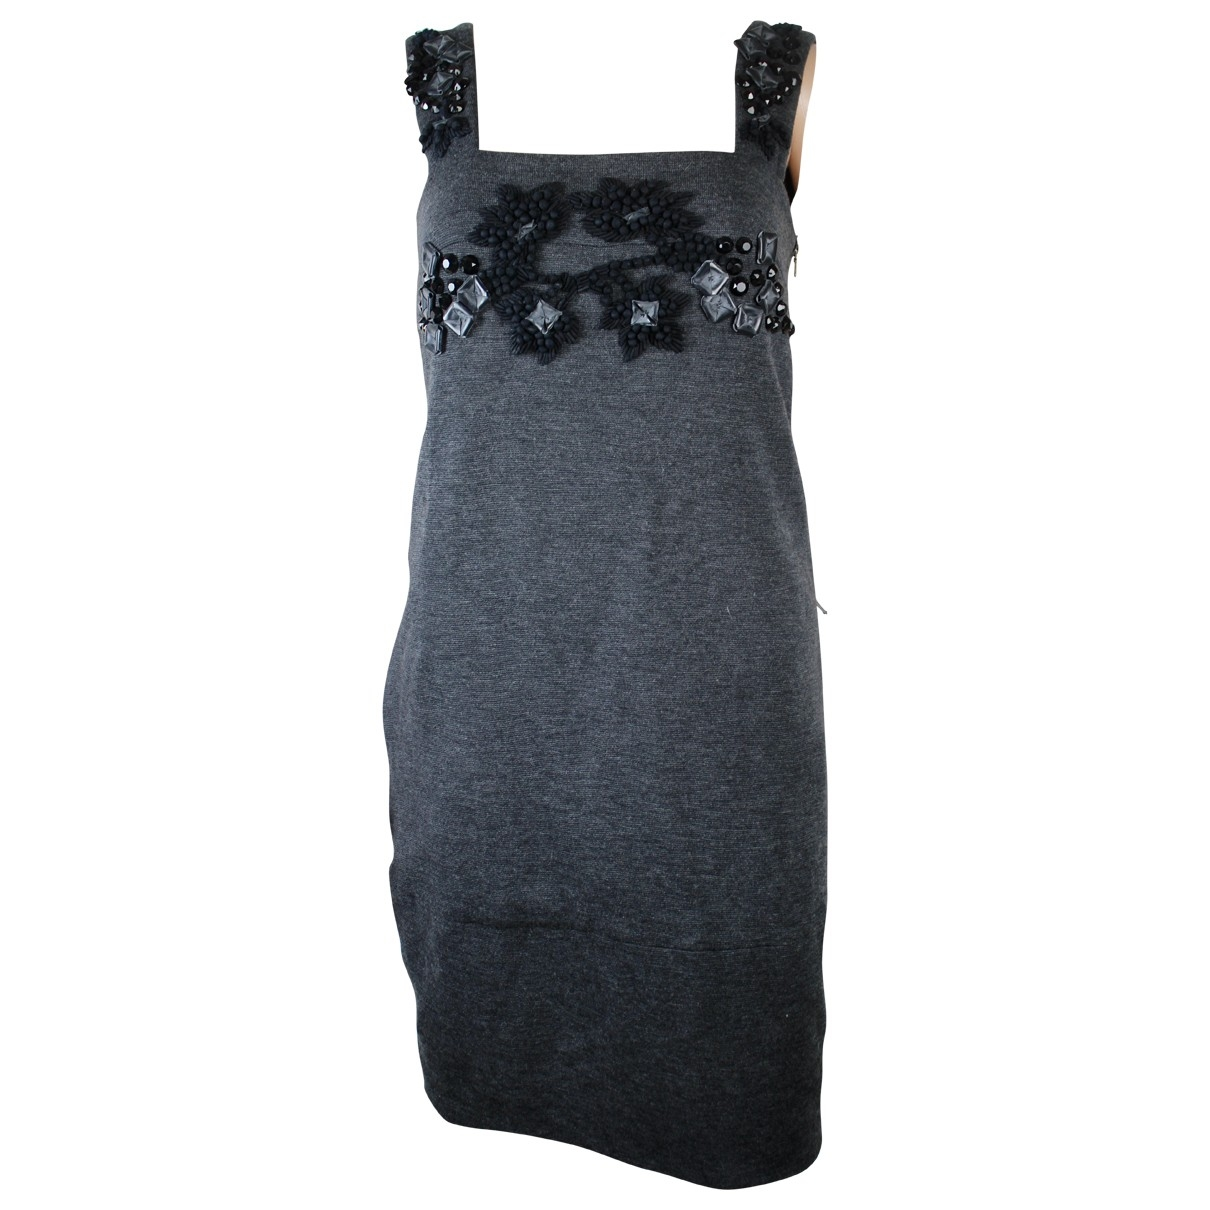 Marni - Robe   pour femme en laine - anthracite